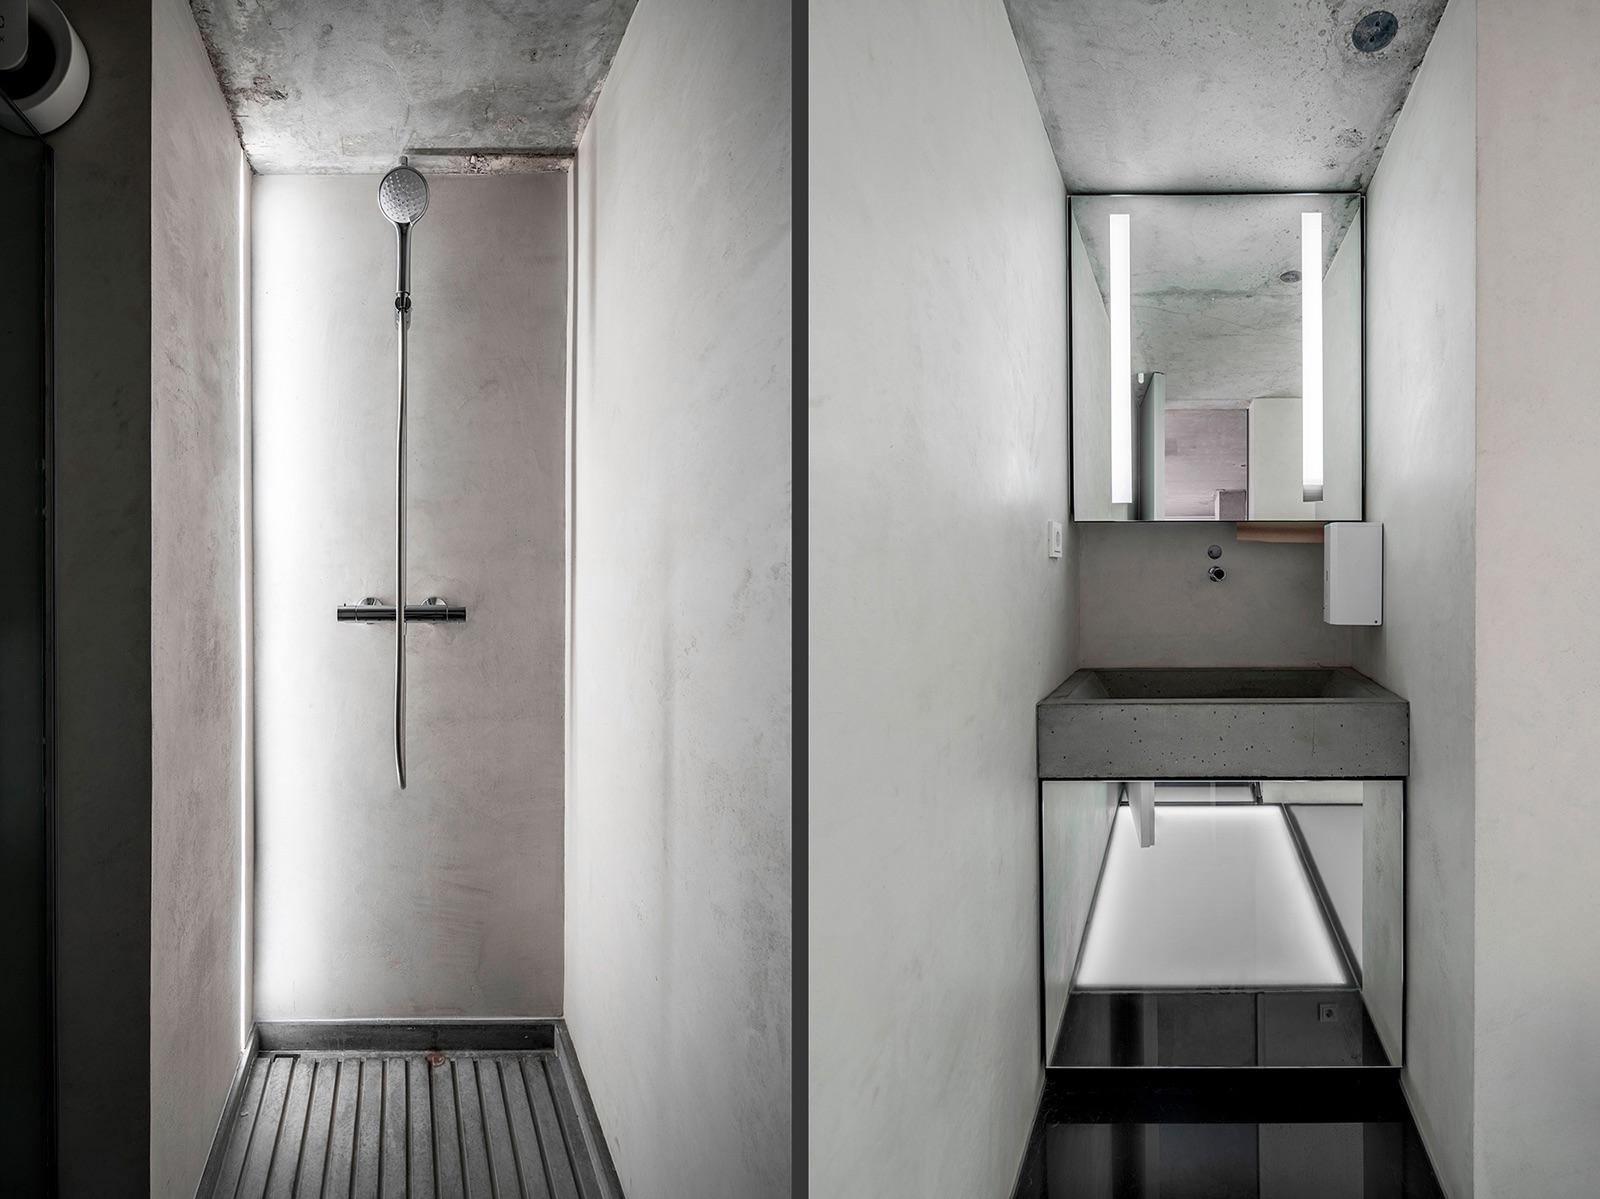 yod-design-lab-office-15